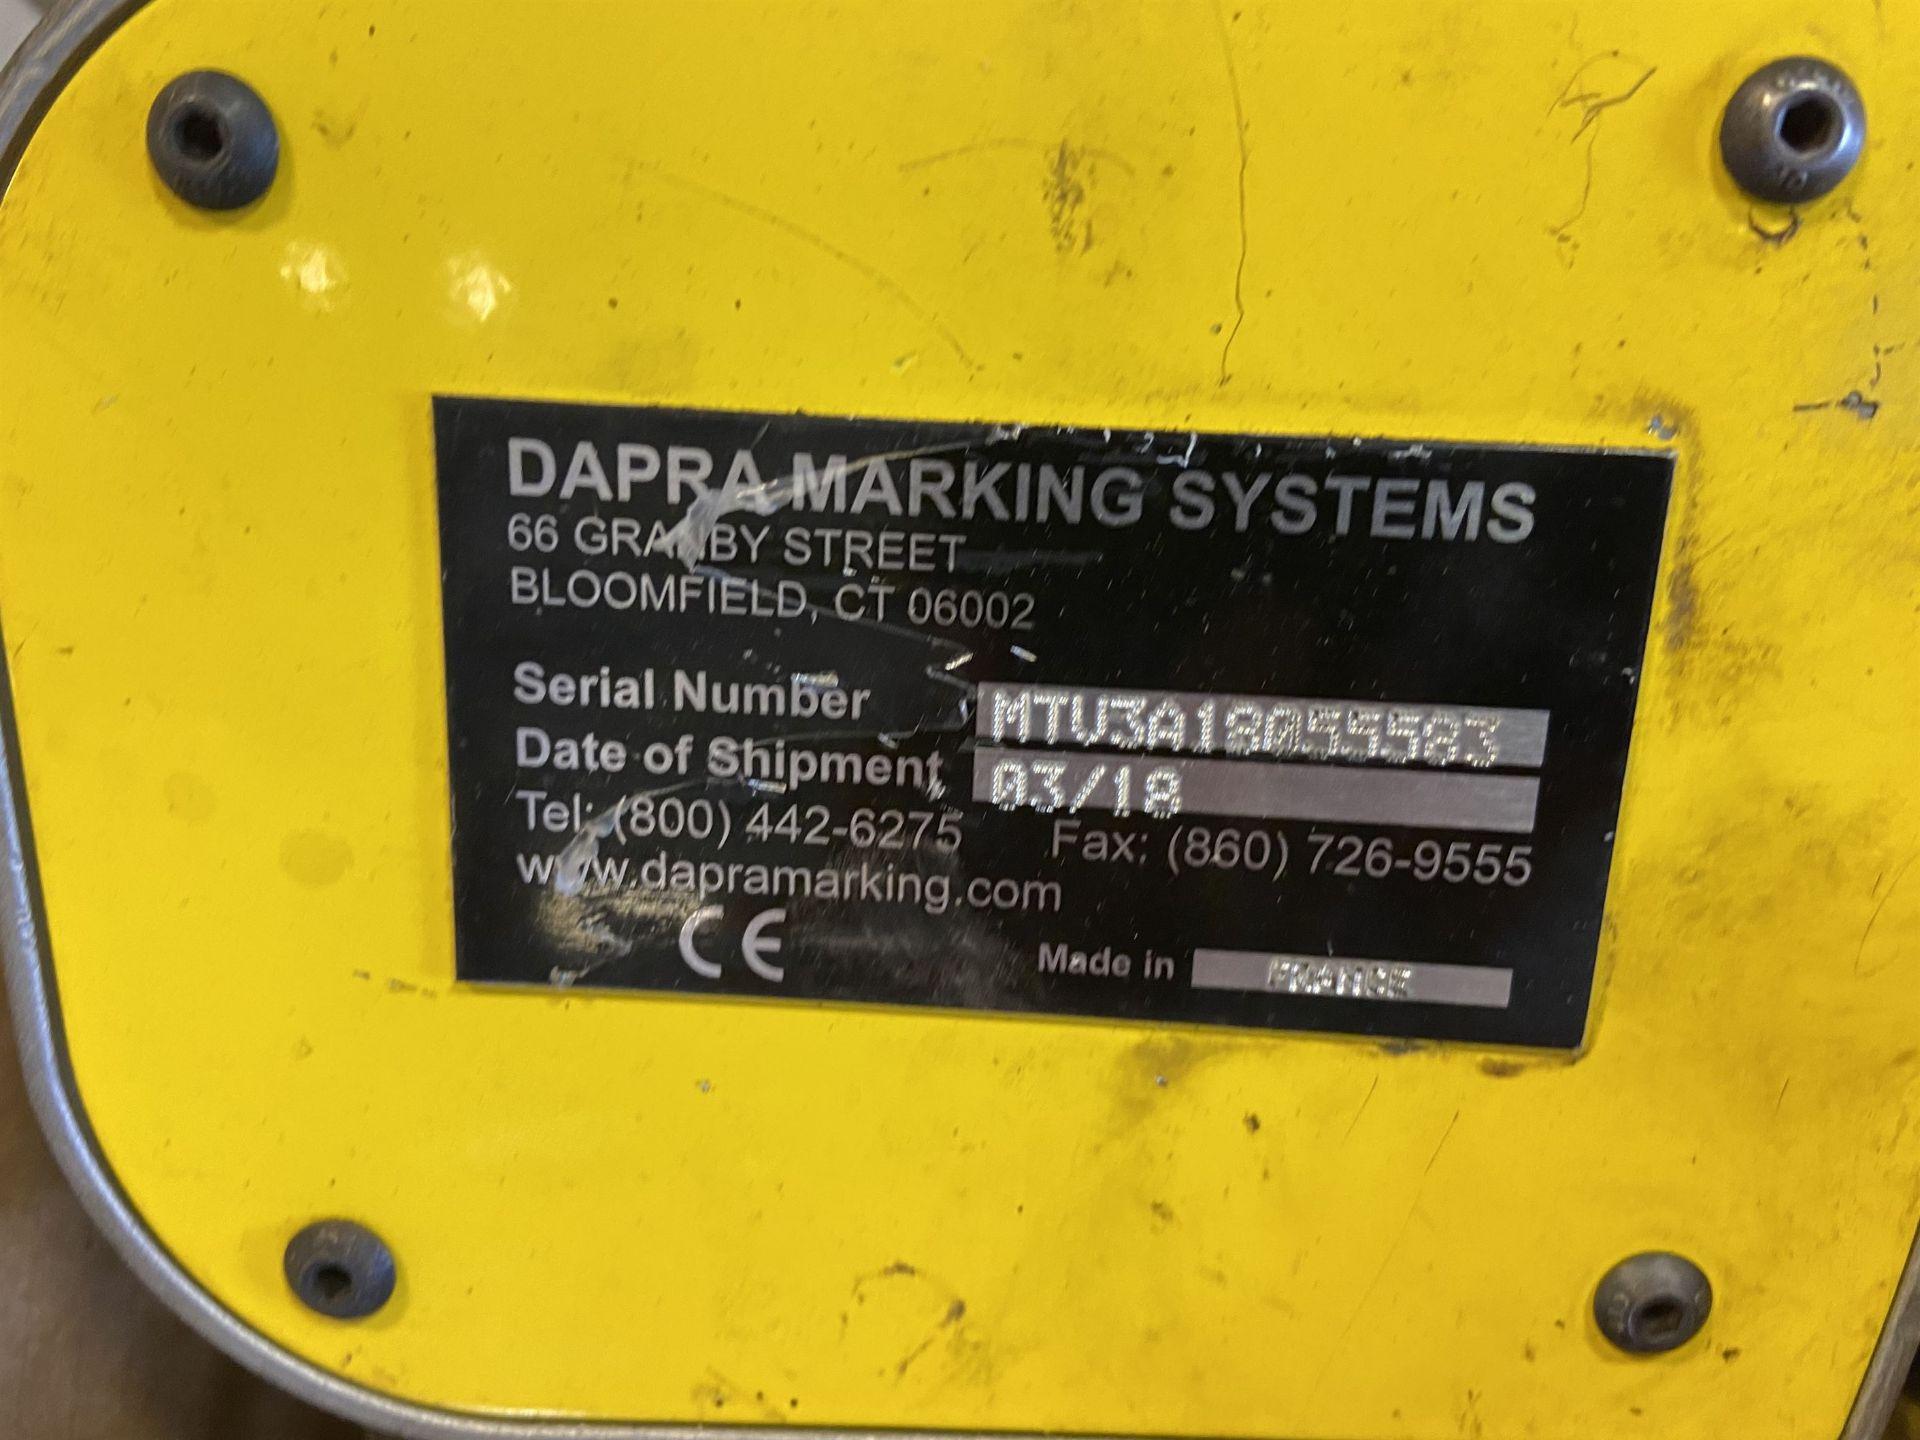 2018 Dapra Technomark Multi 4 Marking Machine with Stand s/n MTV3A18055583 - Image 2 of 2